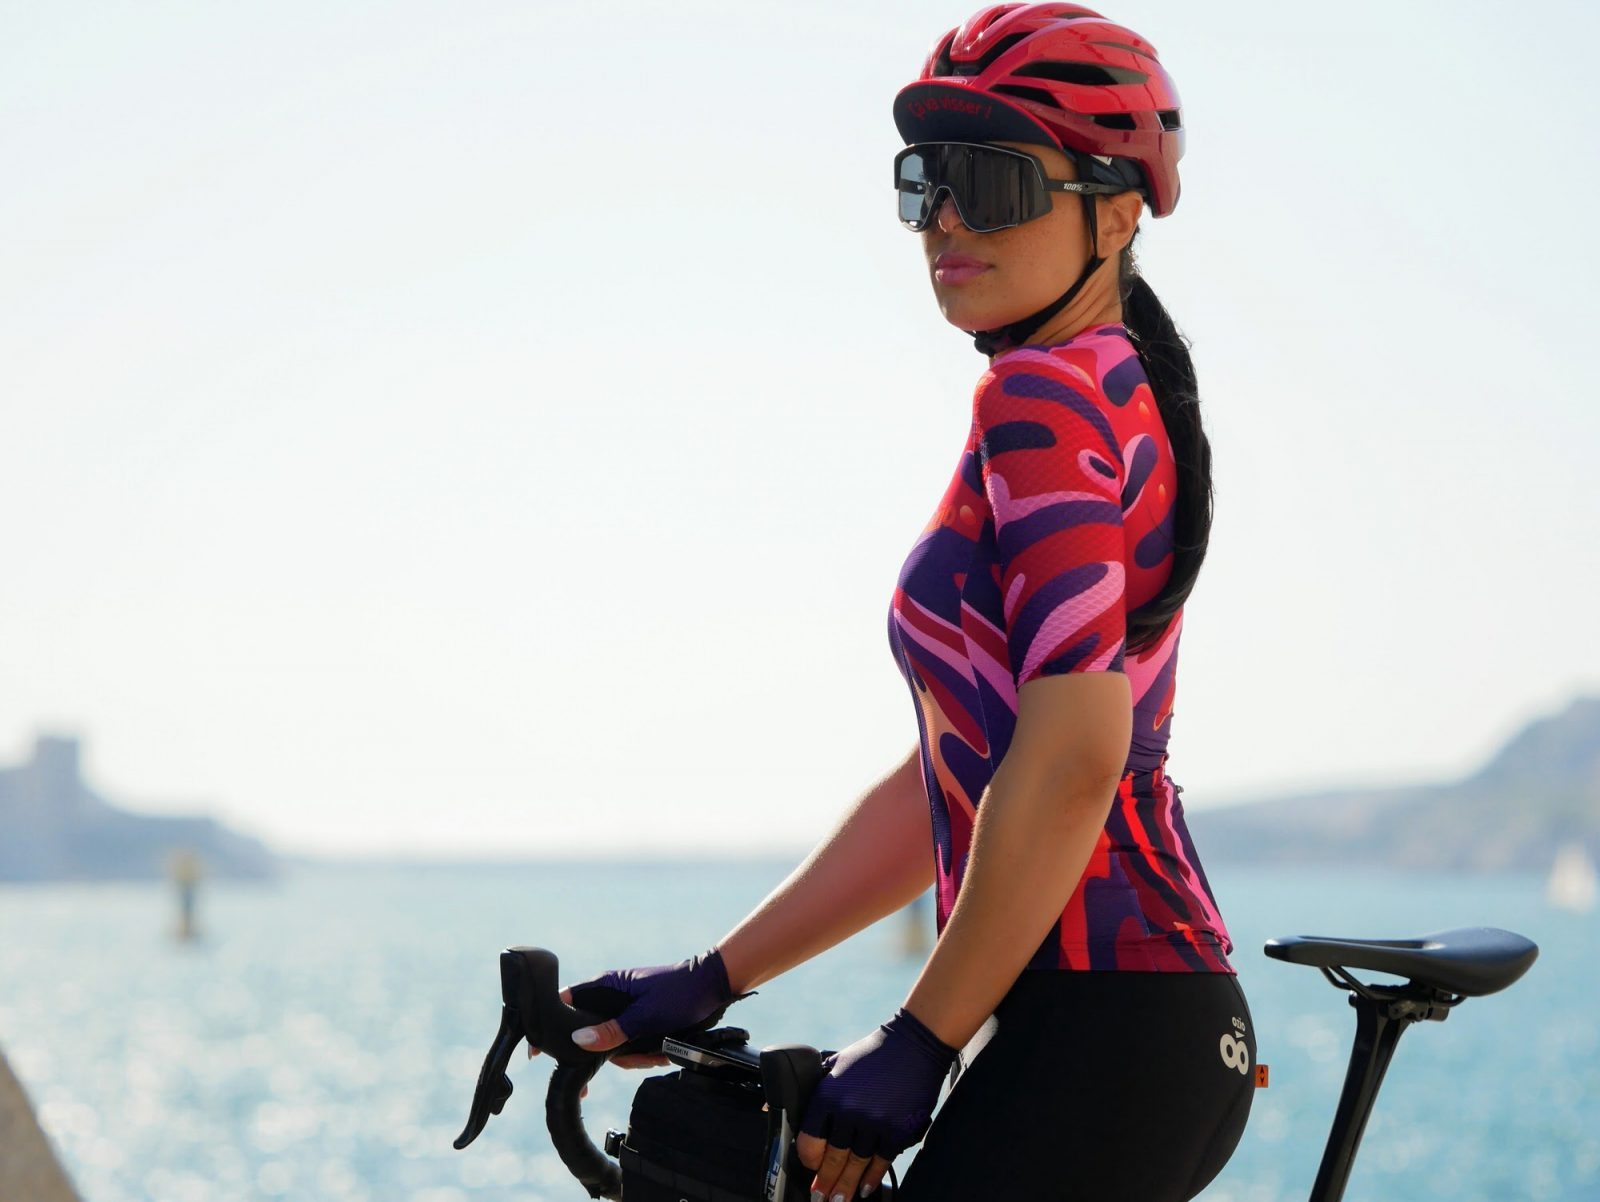 Maillot cycliste été femme OZIO